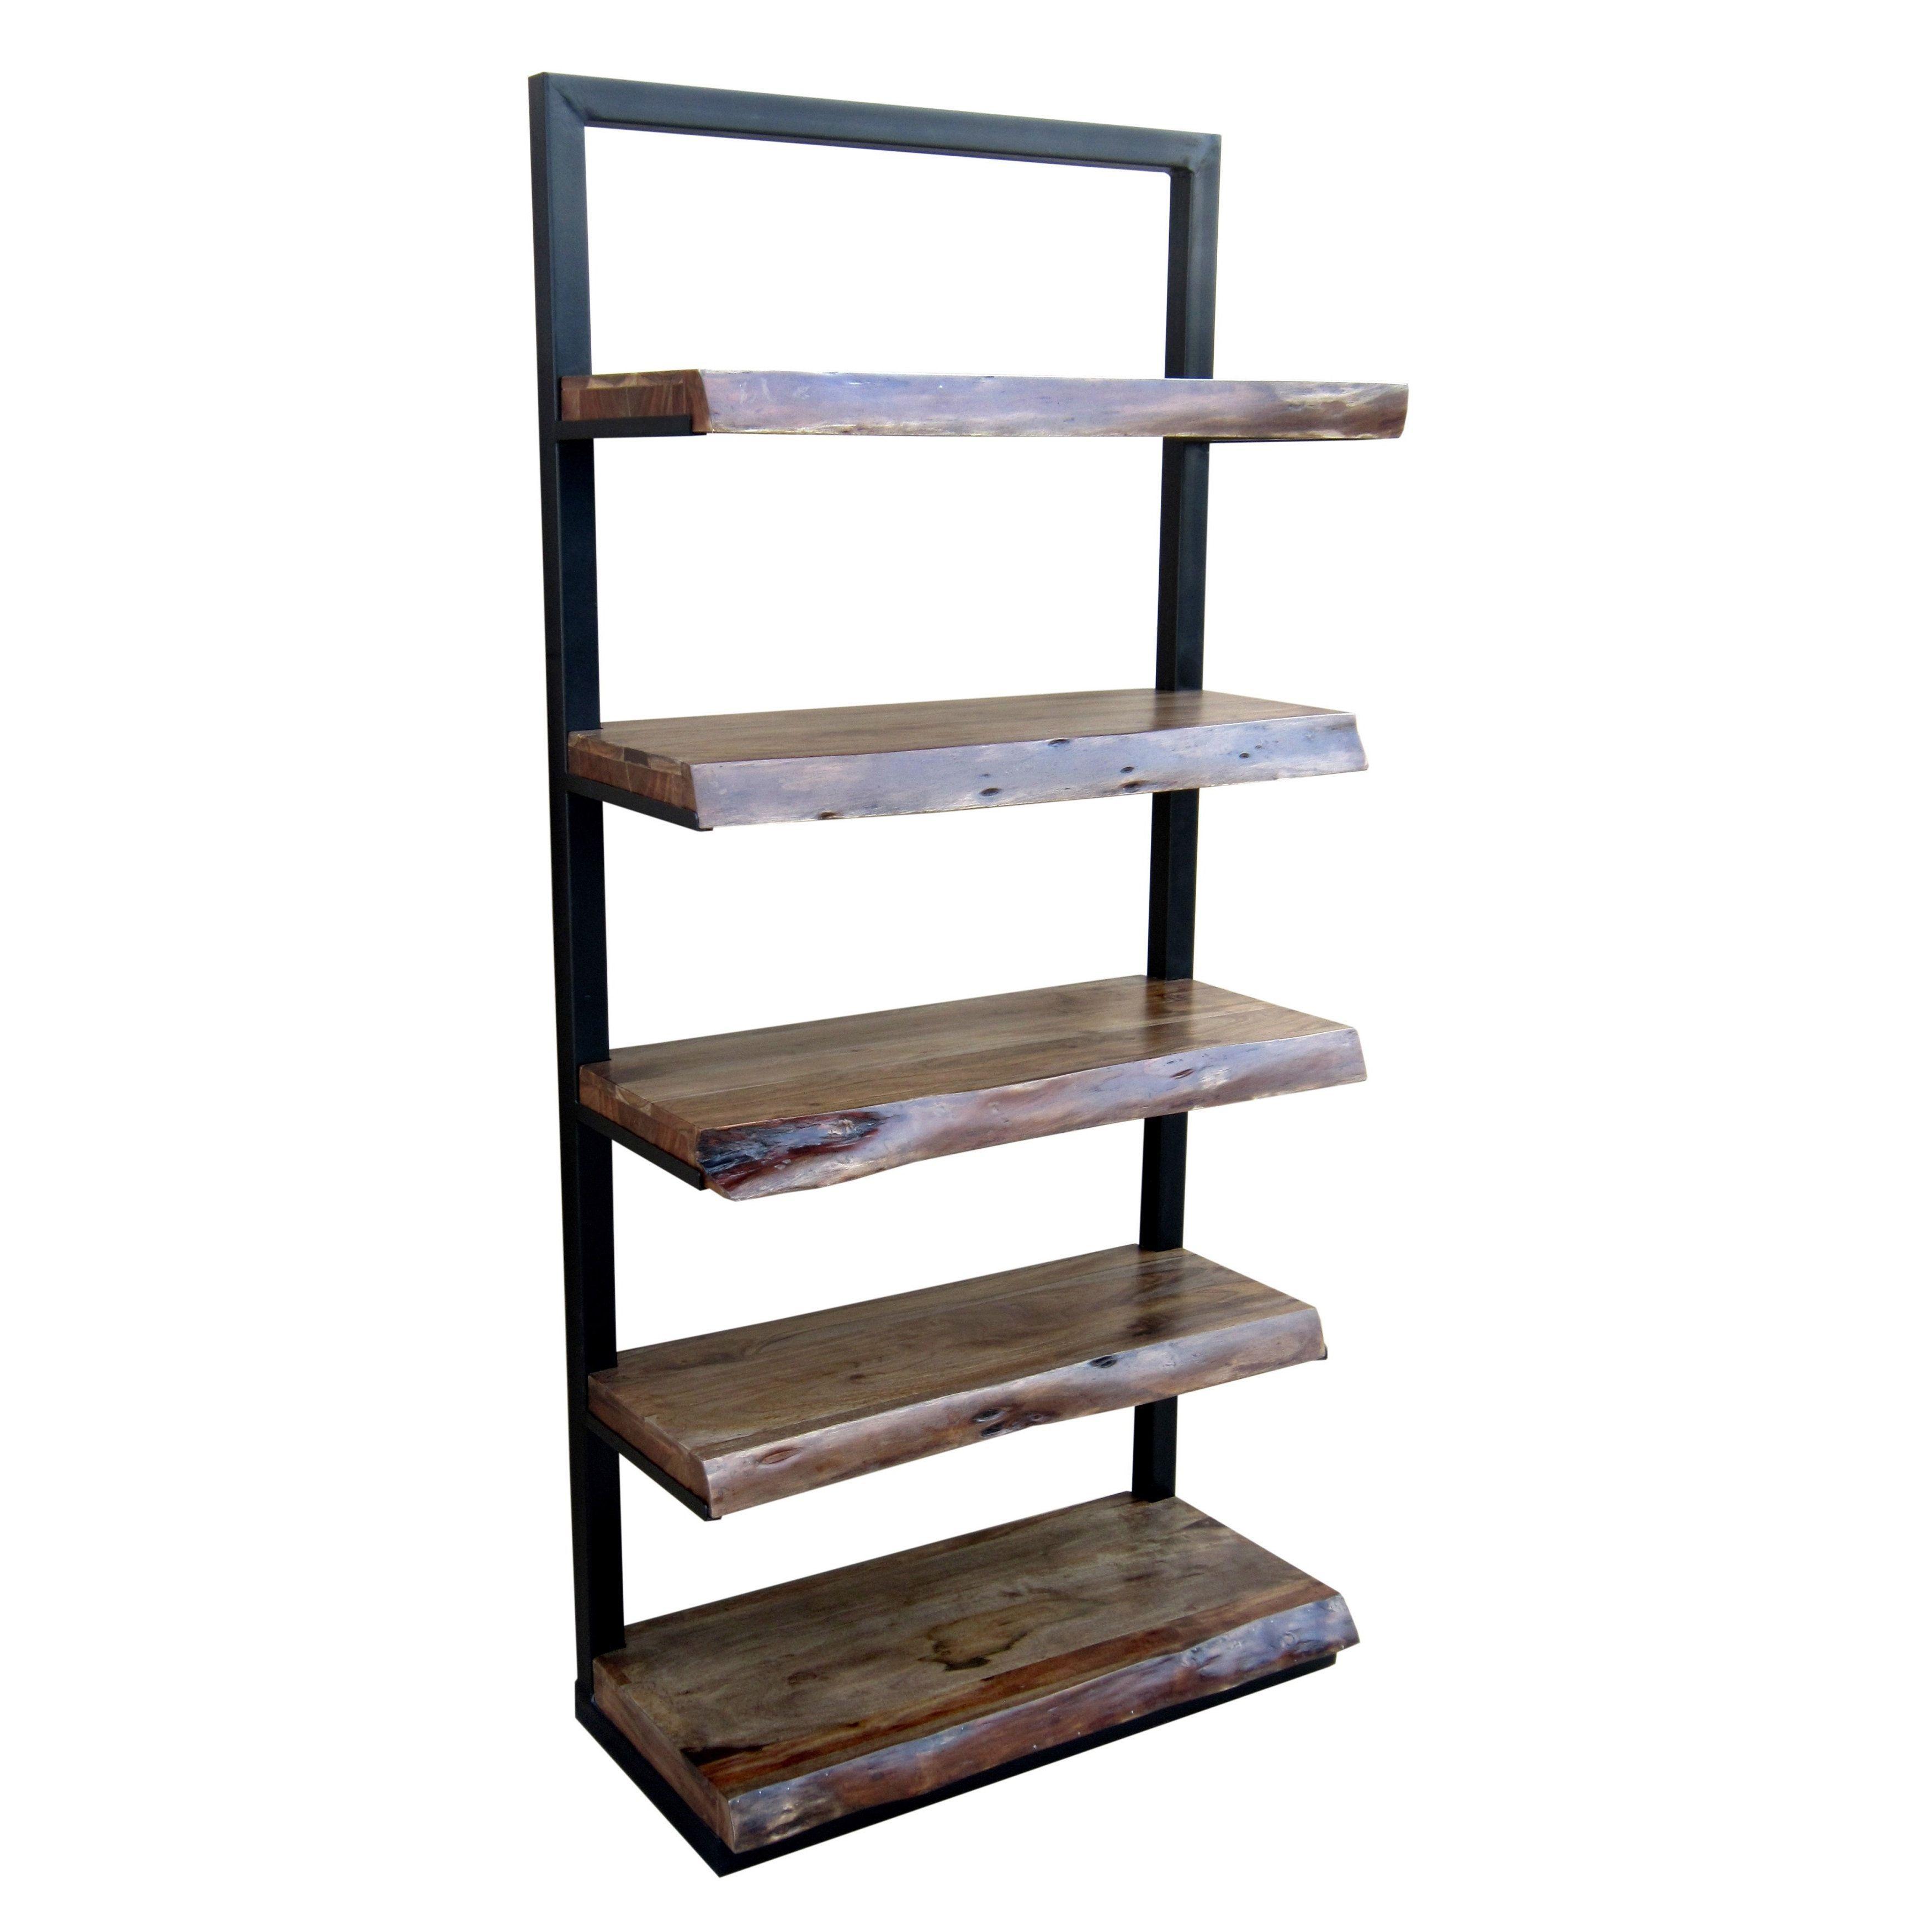 Elk lighting ladder shelf black frame bookshelf outlet store and